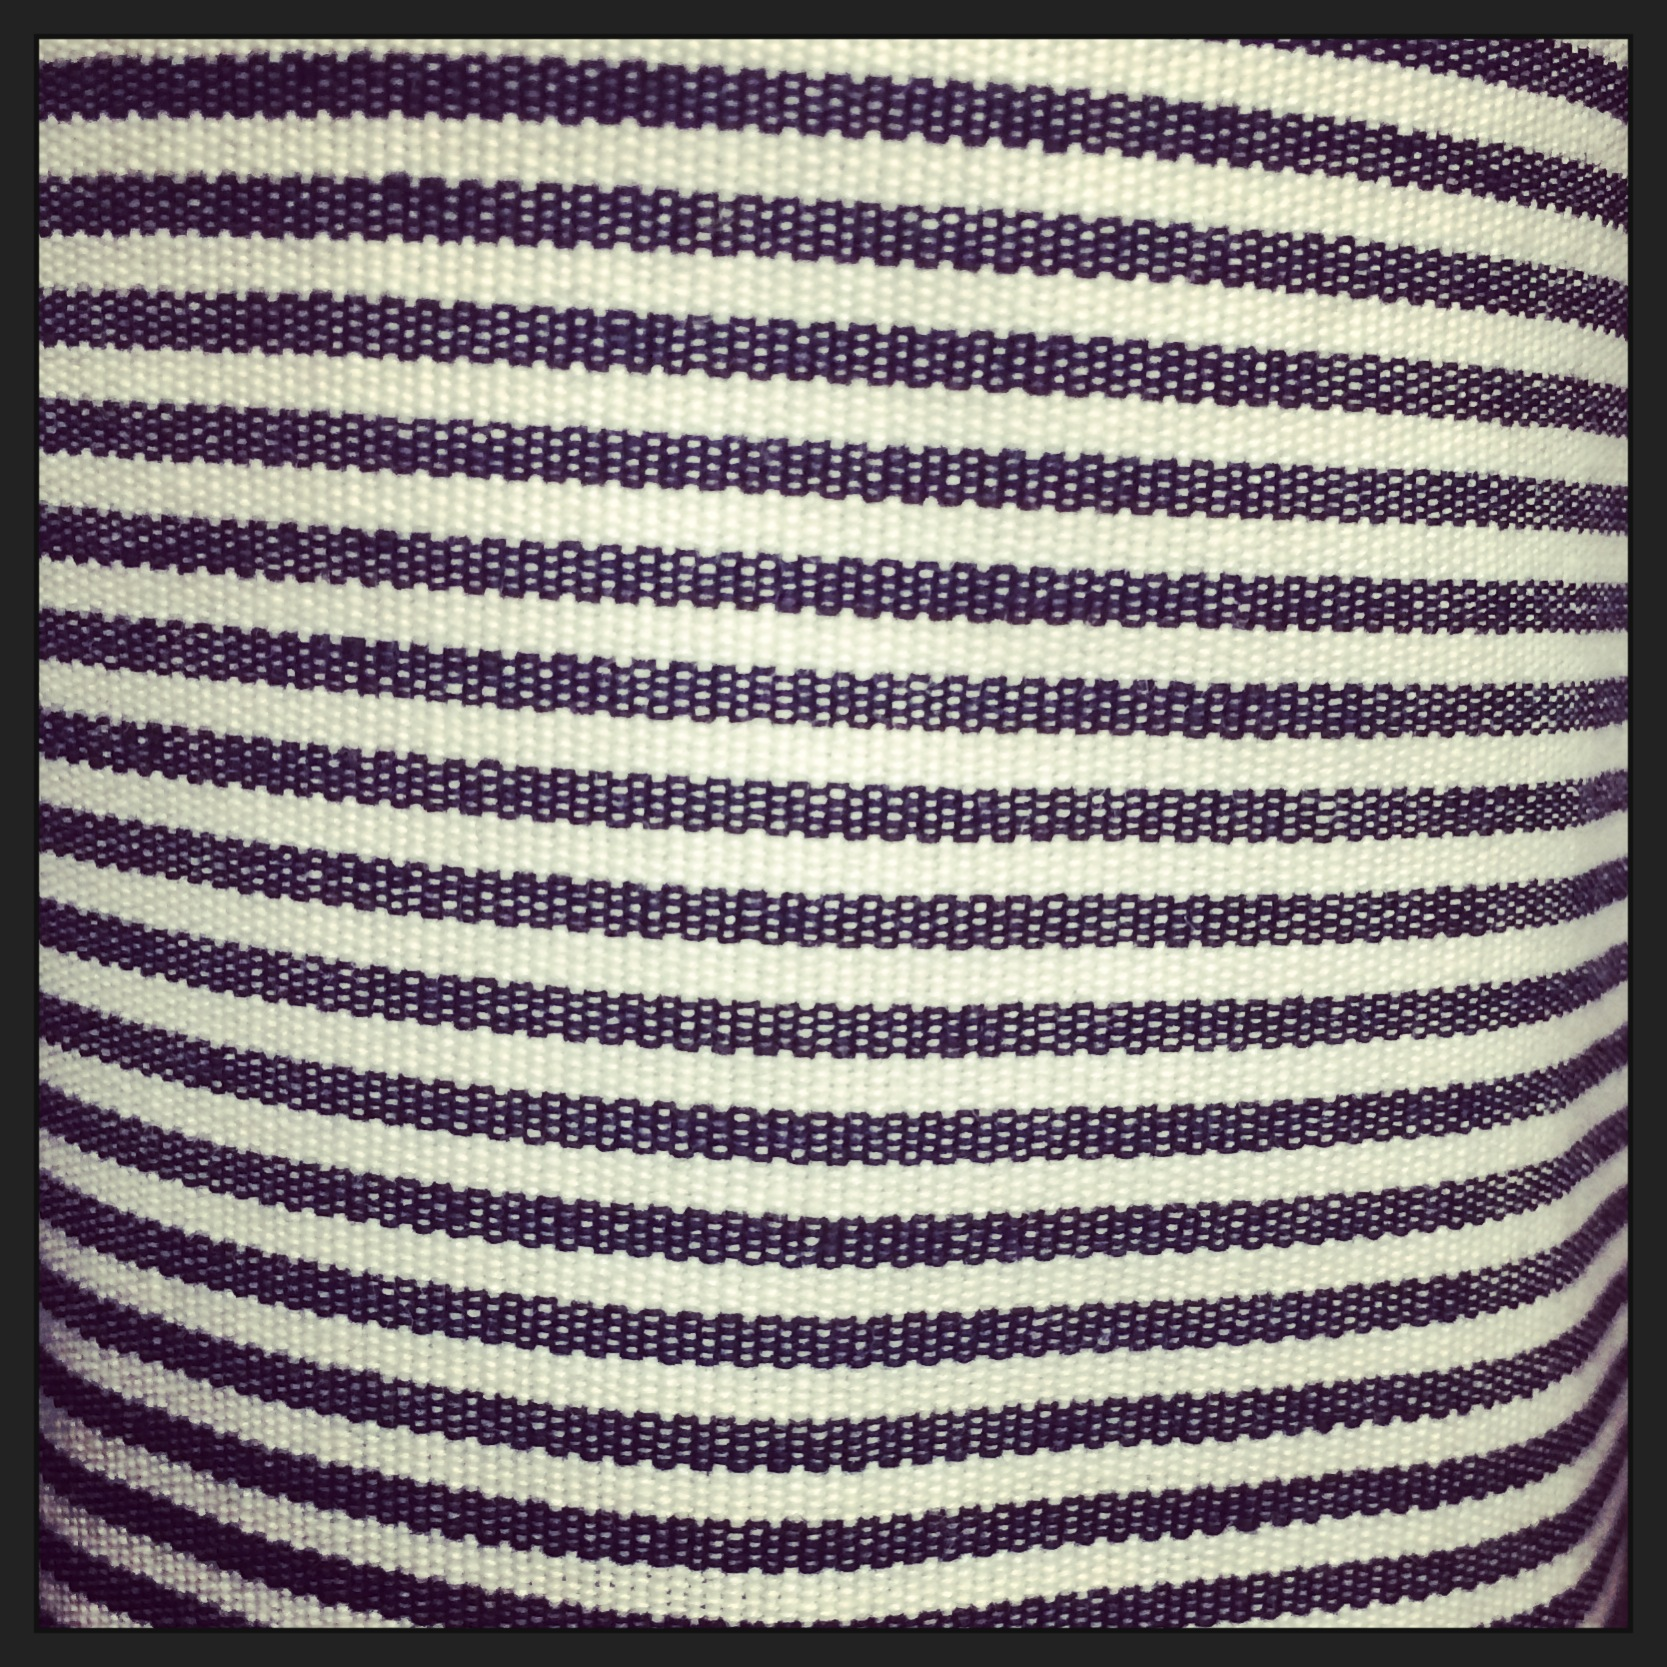 blackandwhite-fabric-ticking stripe-asimplerdesign